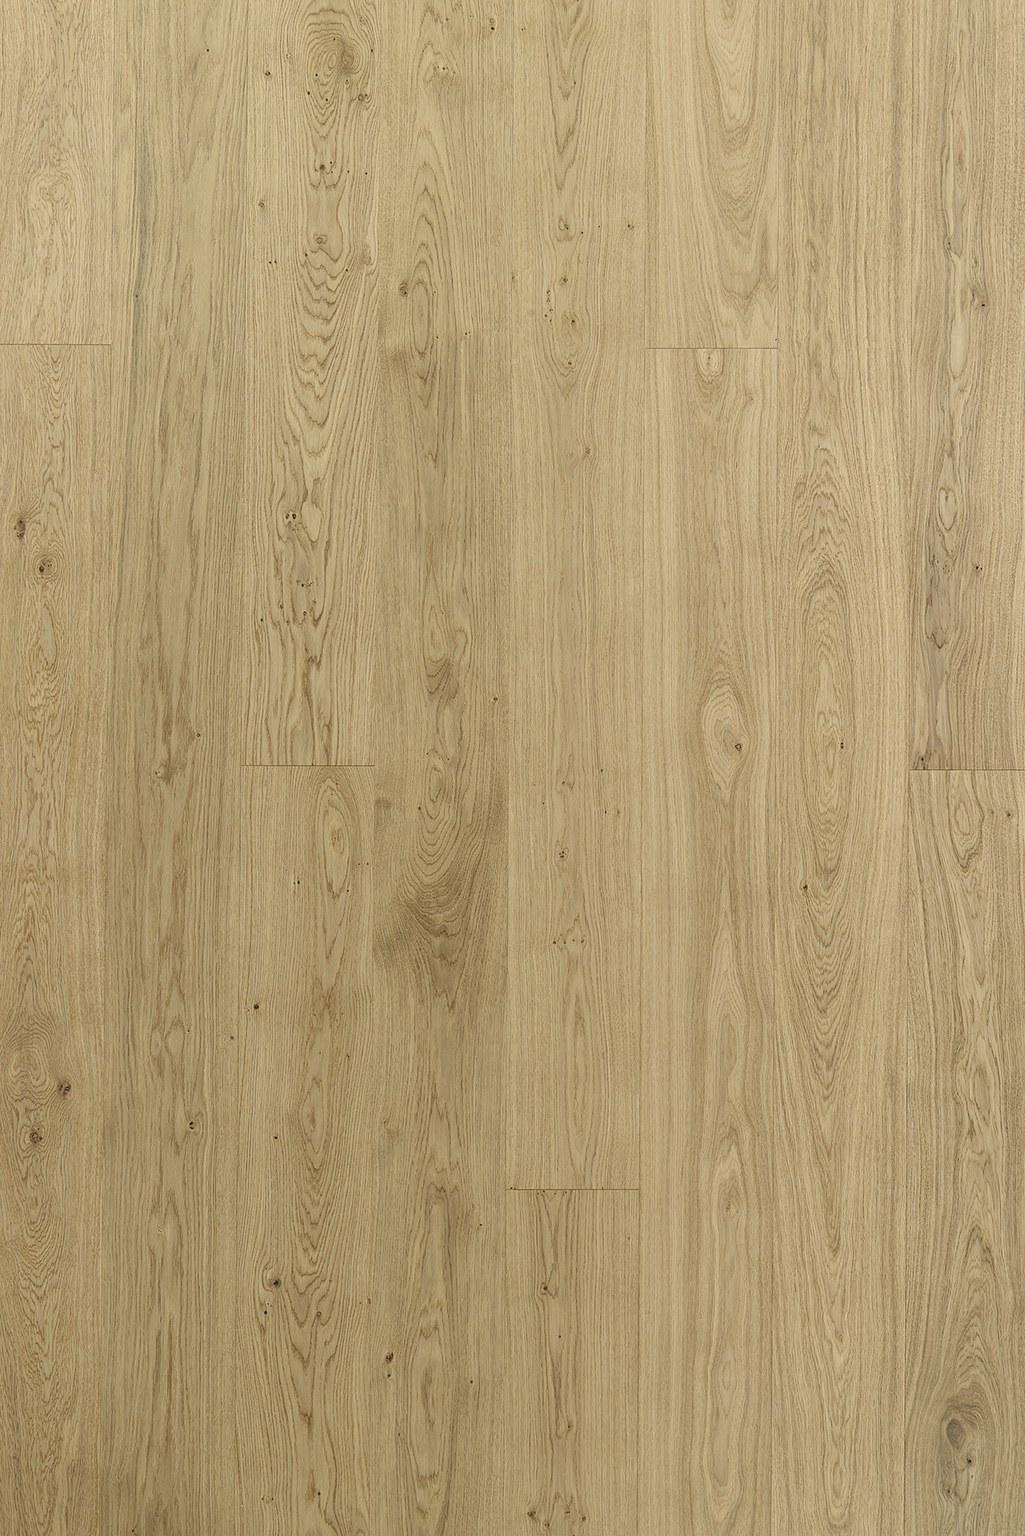 Timberwise Parketti Lankkuparketti Puulattia Wooden Floor Parquet Plank Tammi Oak Nordic 2D1